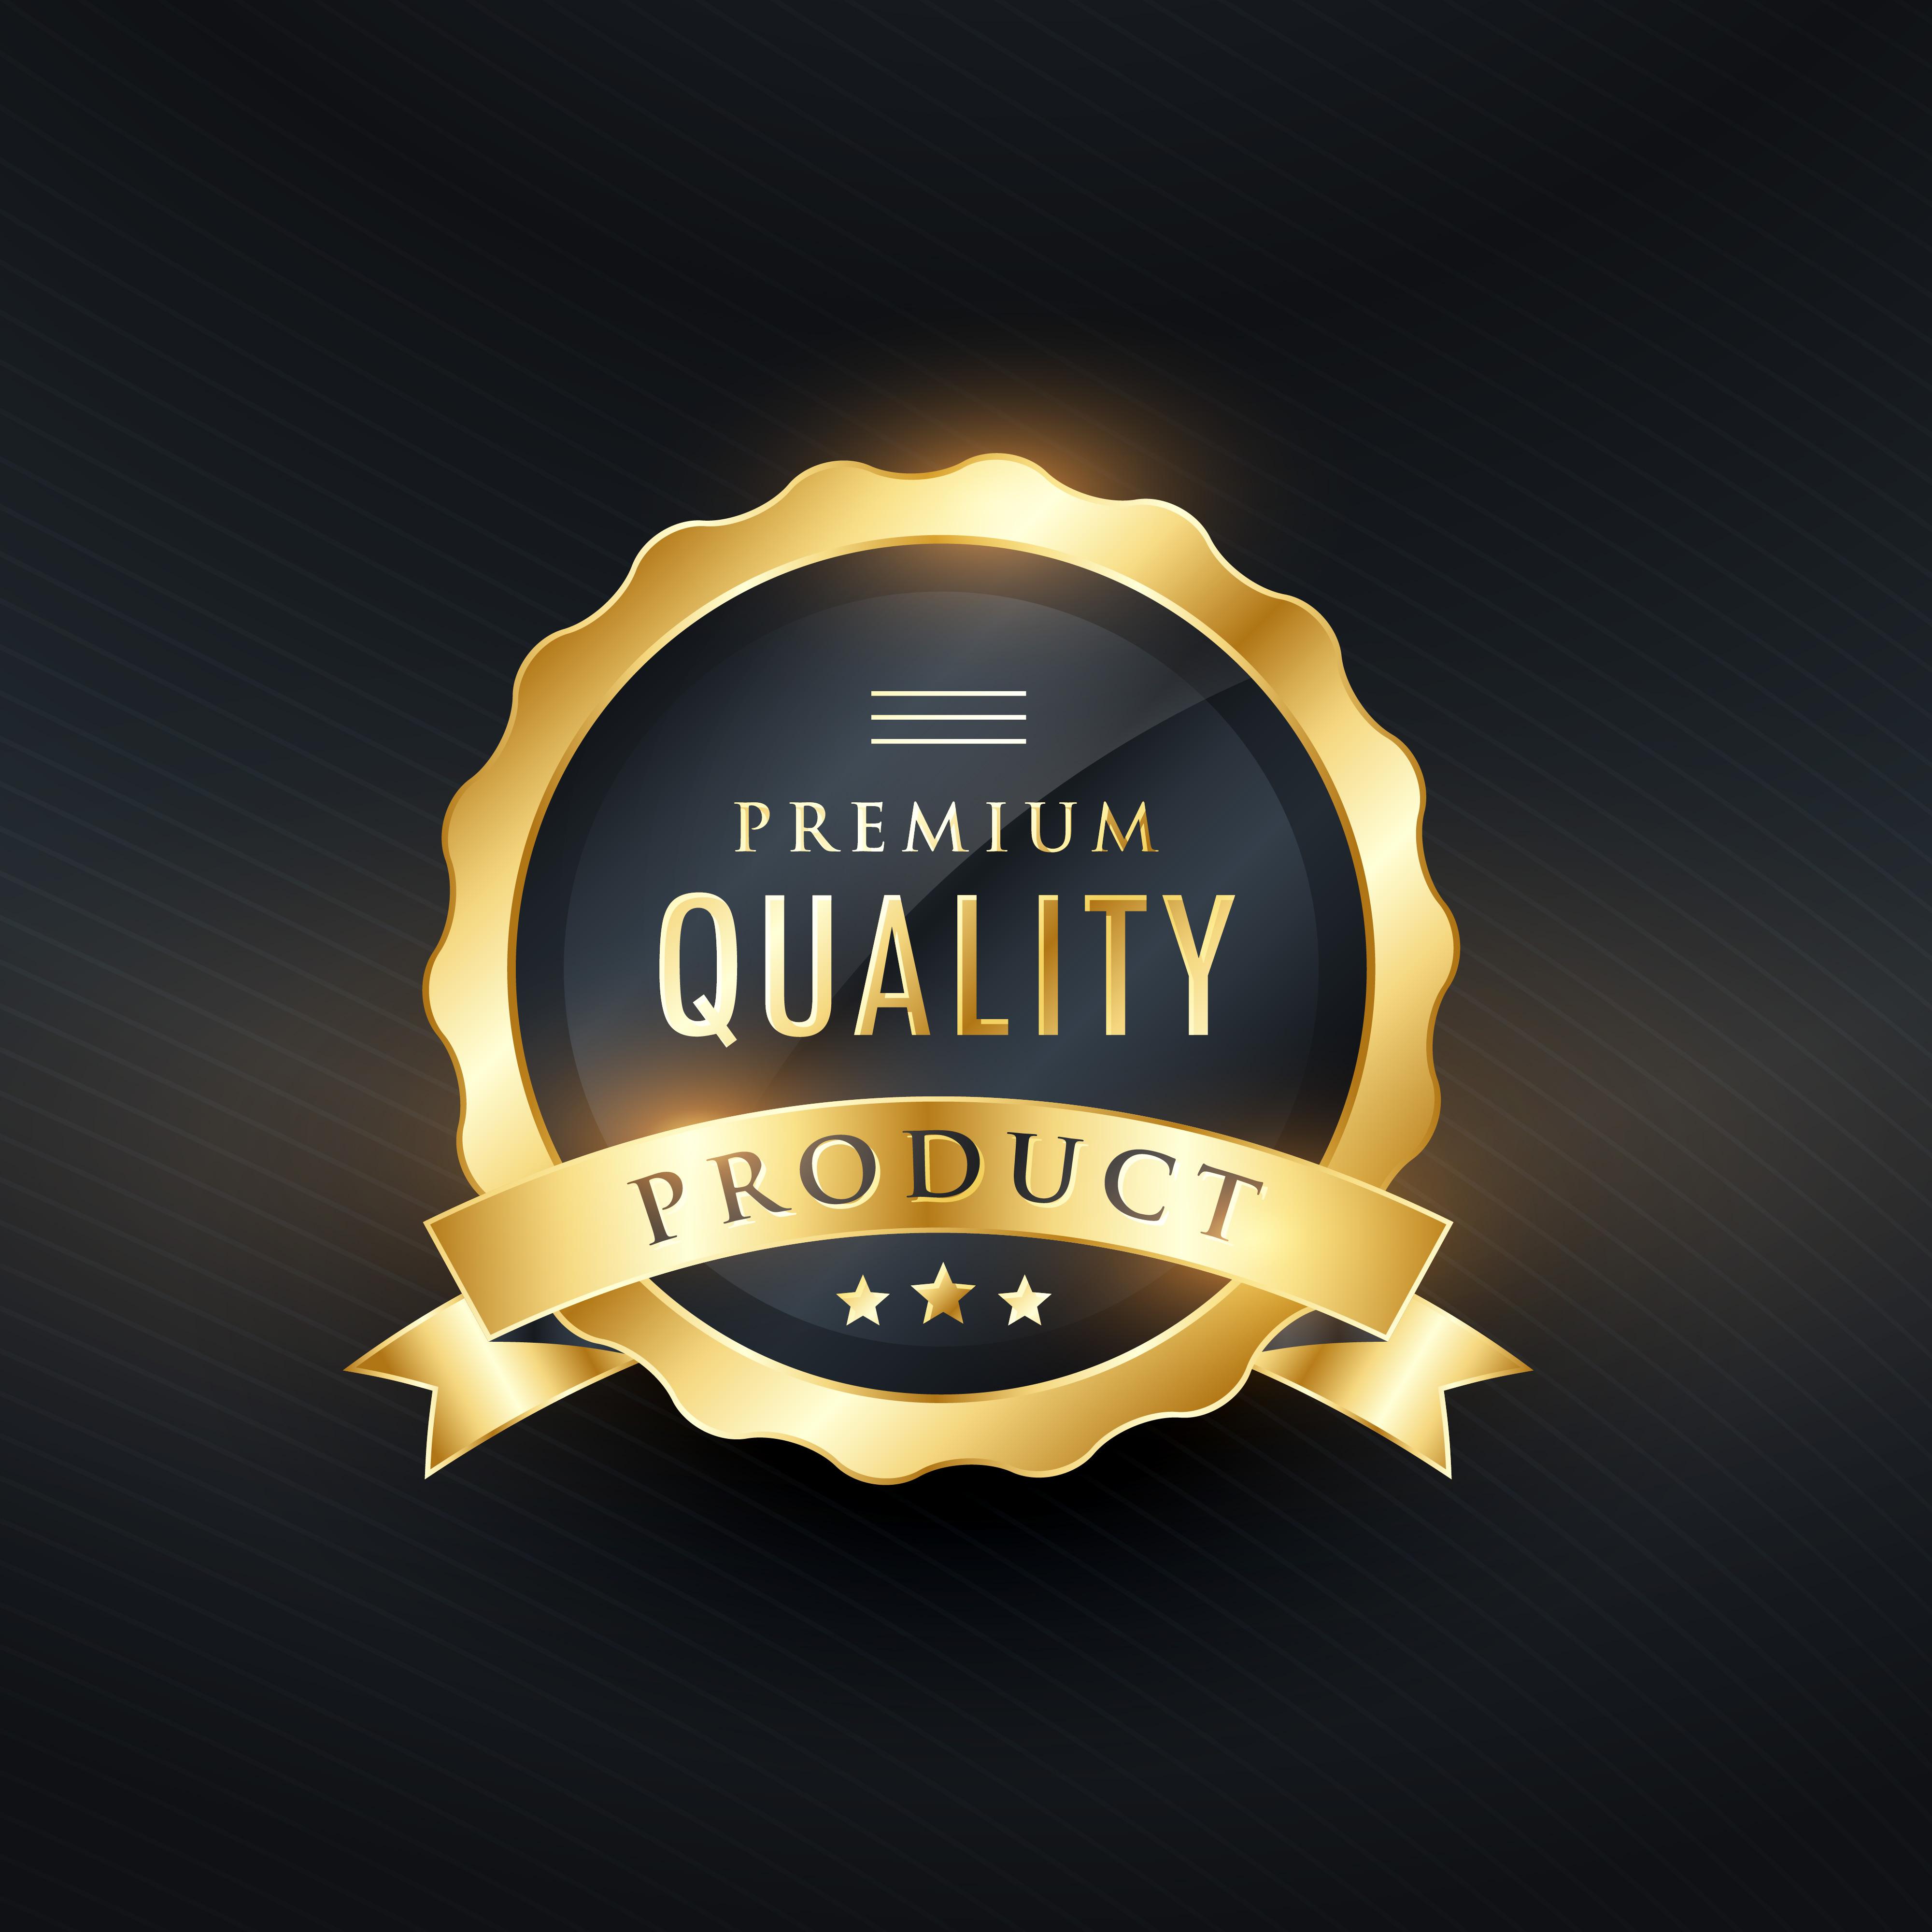 premium quality product golden label design - Download ...